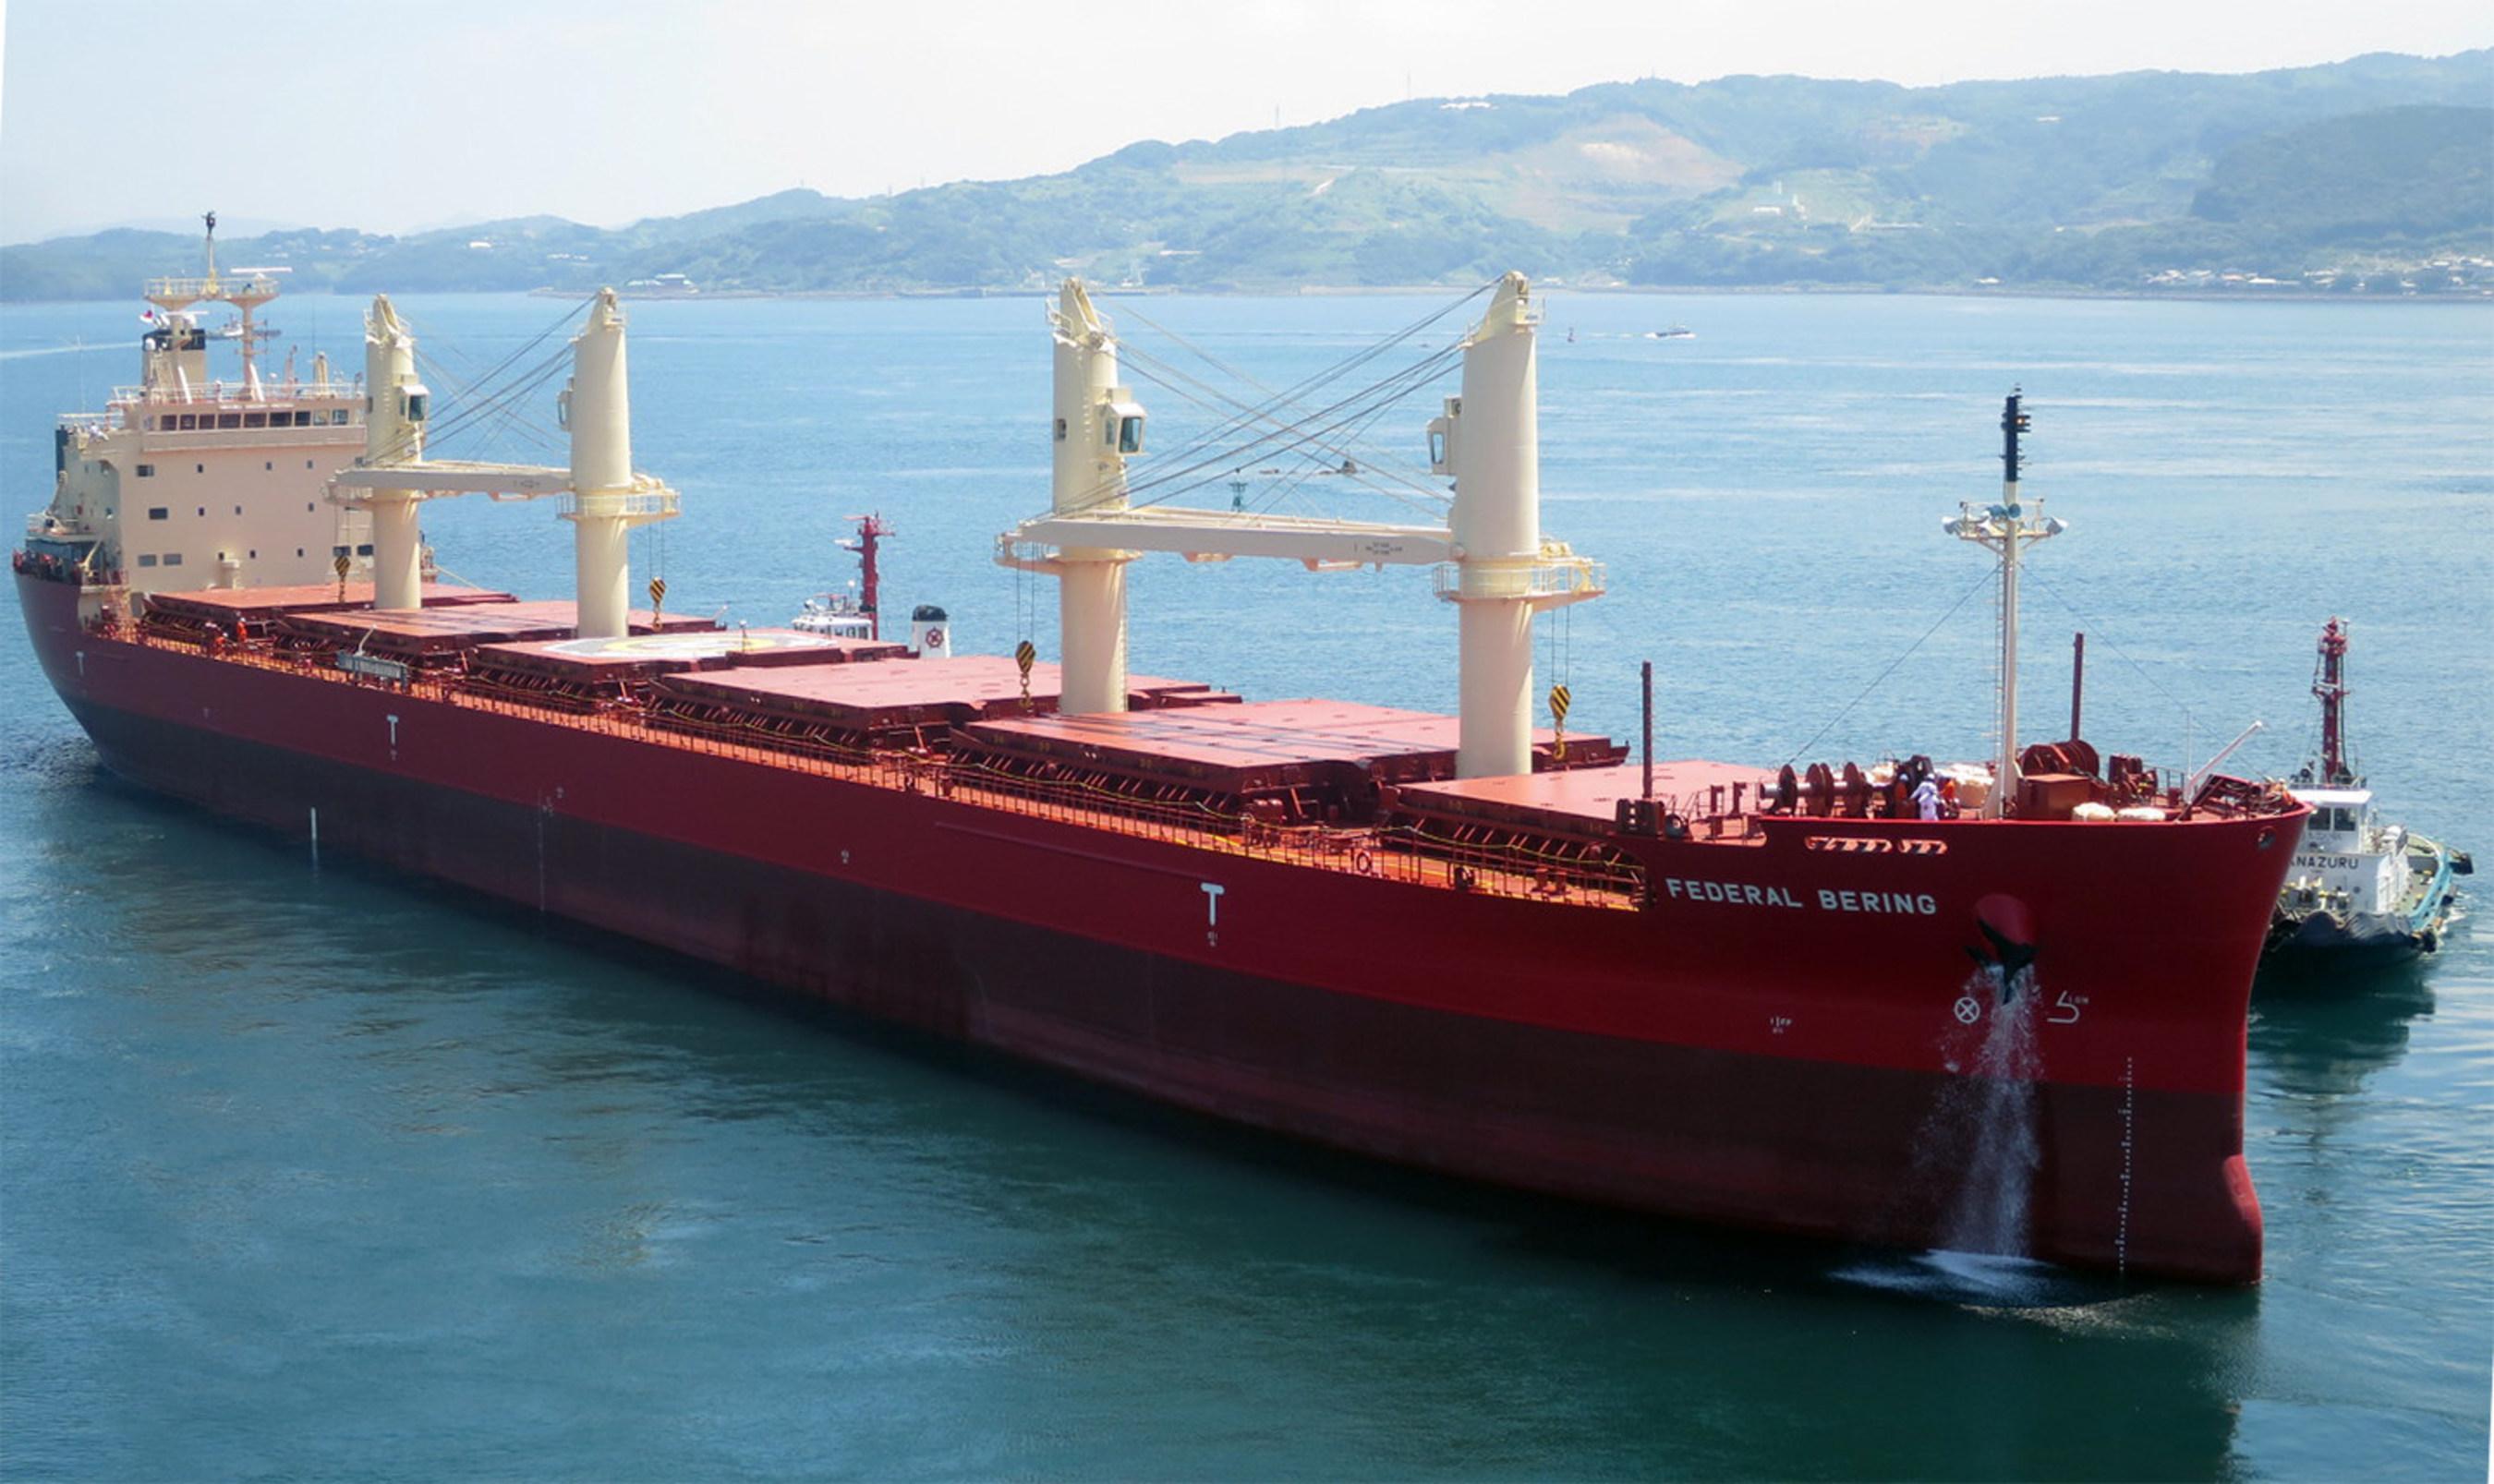 Fednav celebrates arrival of new vessel at Port of Antwerp